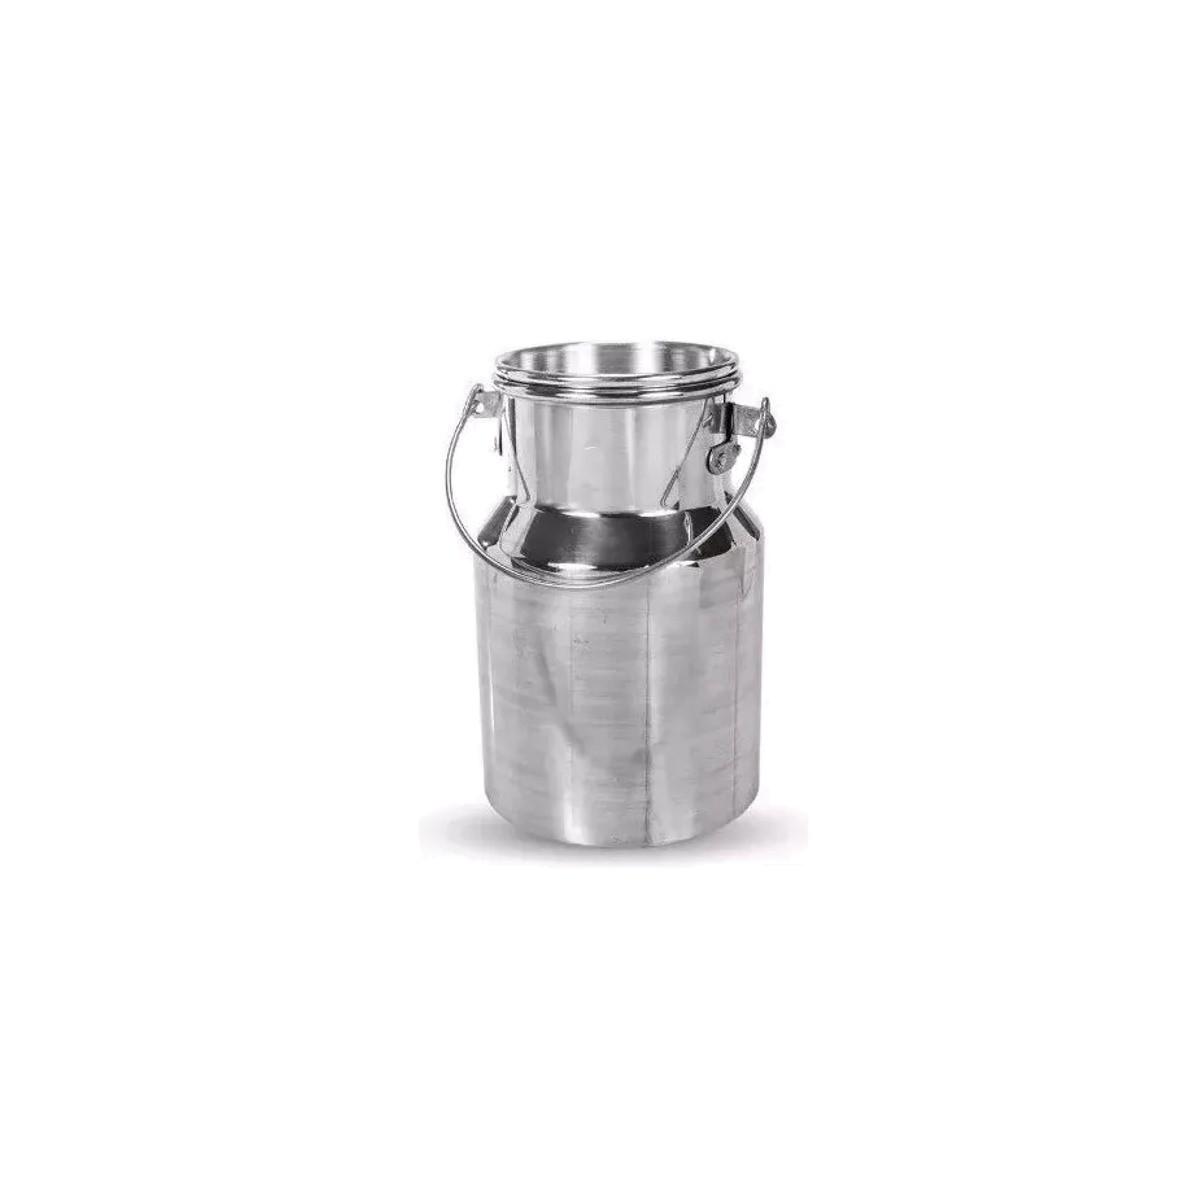 Depósito para Leite (leiteira) Continental - 1,2 Litros  - Panela de Ferro Fundido